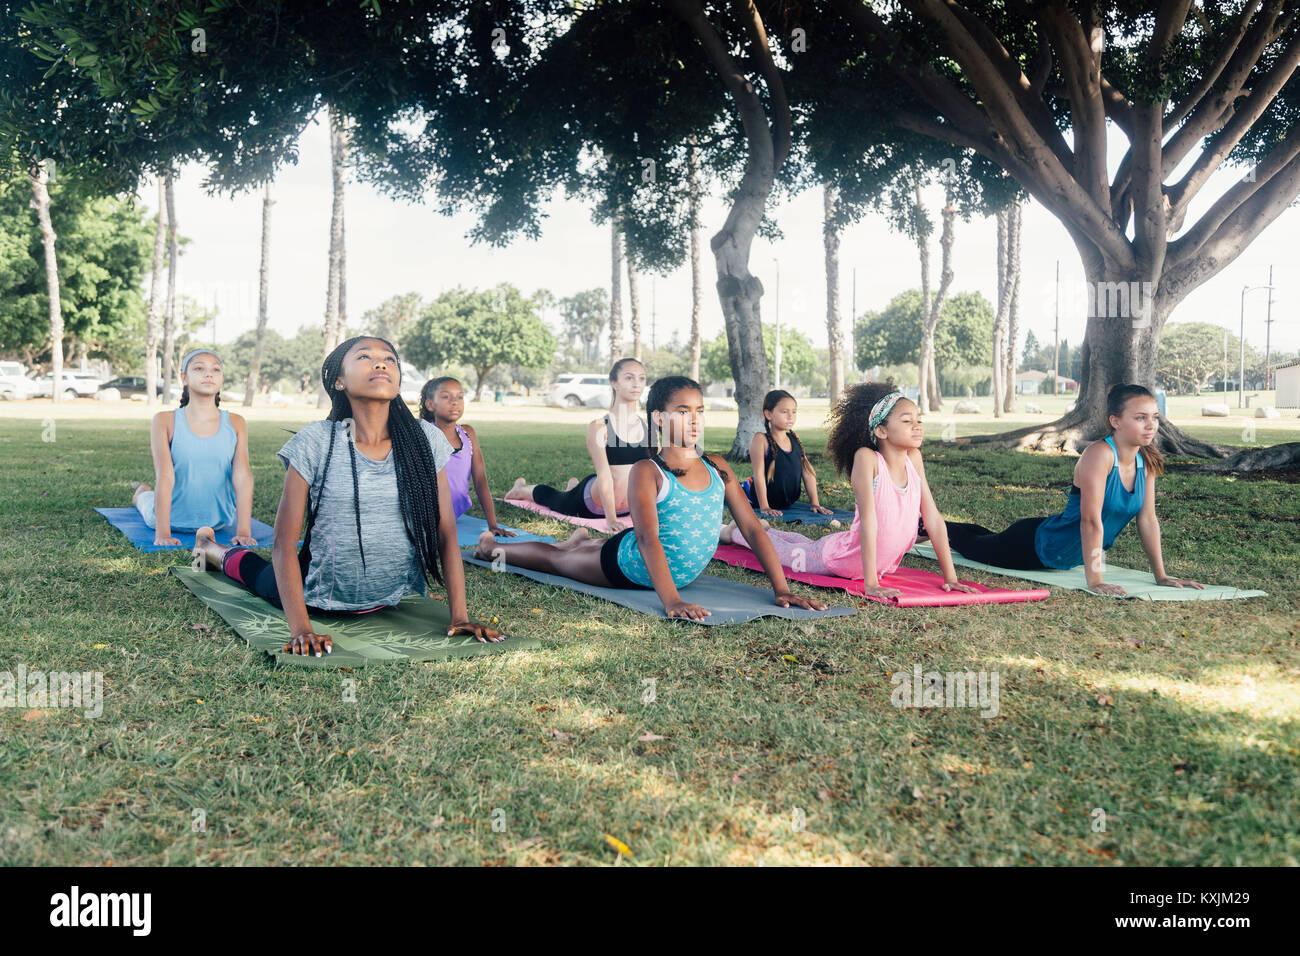 Schoolgirls practicing yoga upward facing dog pose on school sports field - Stock Image